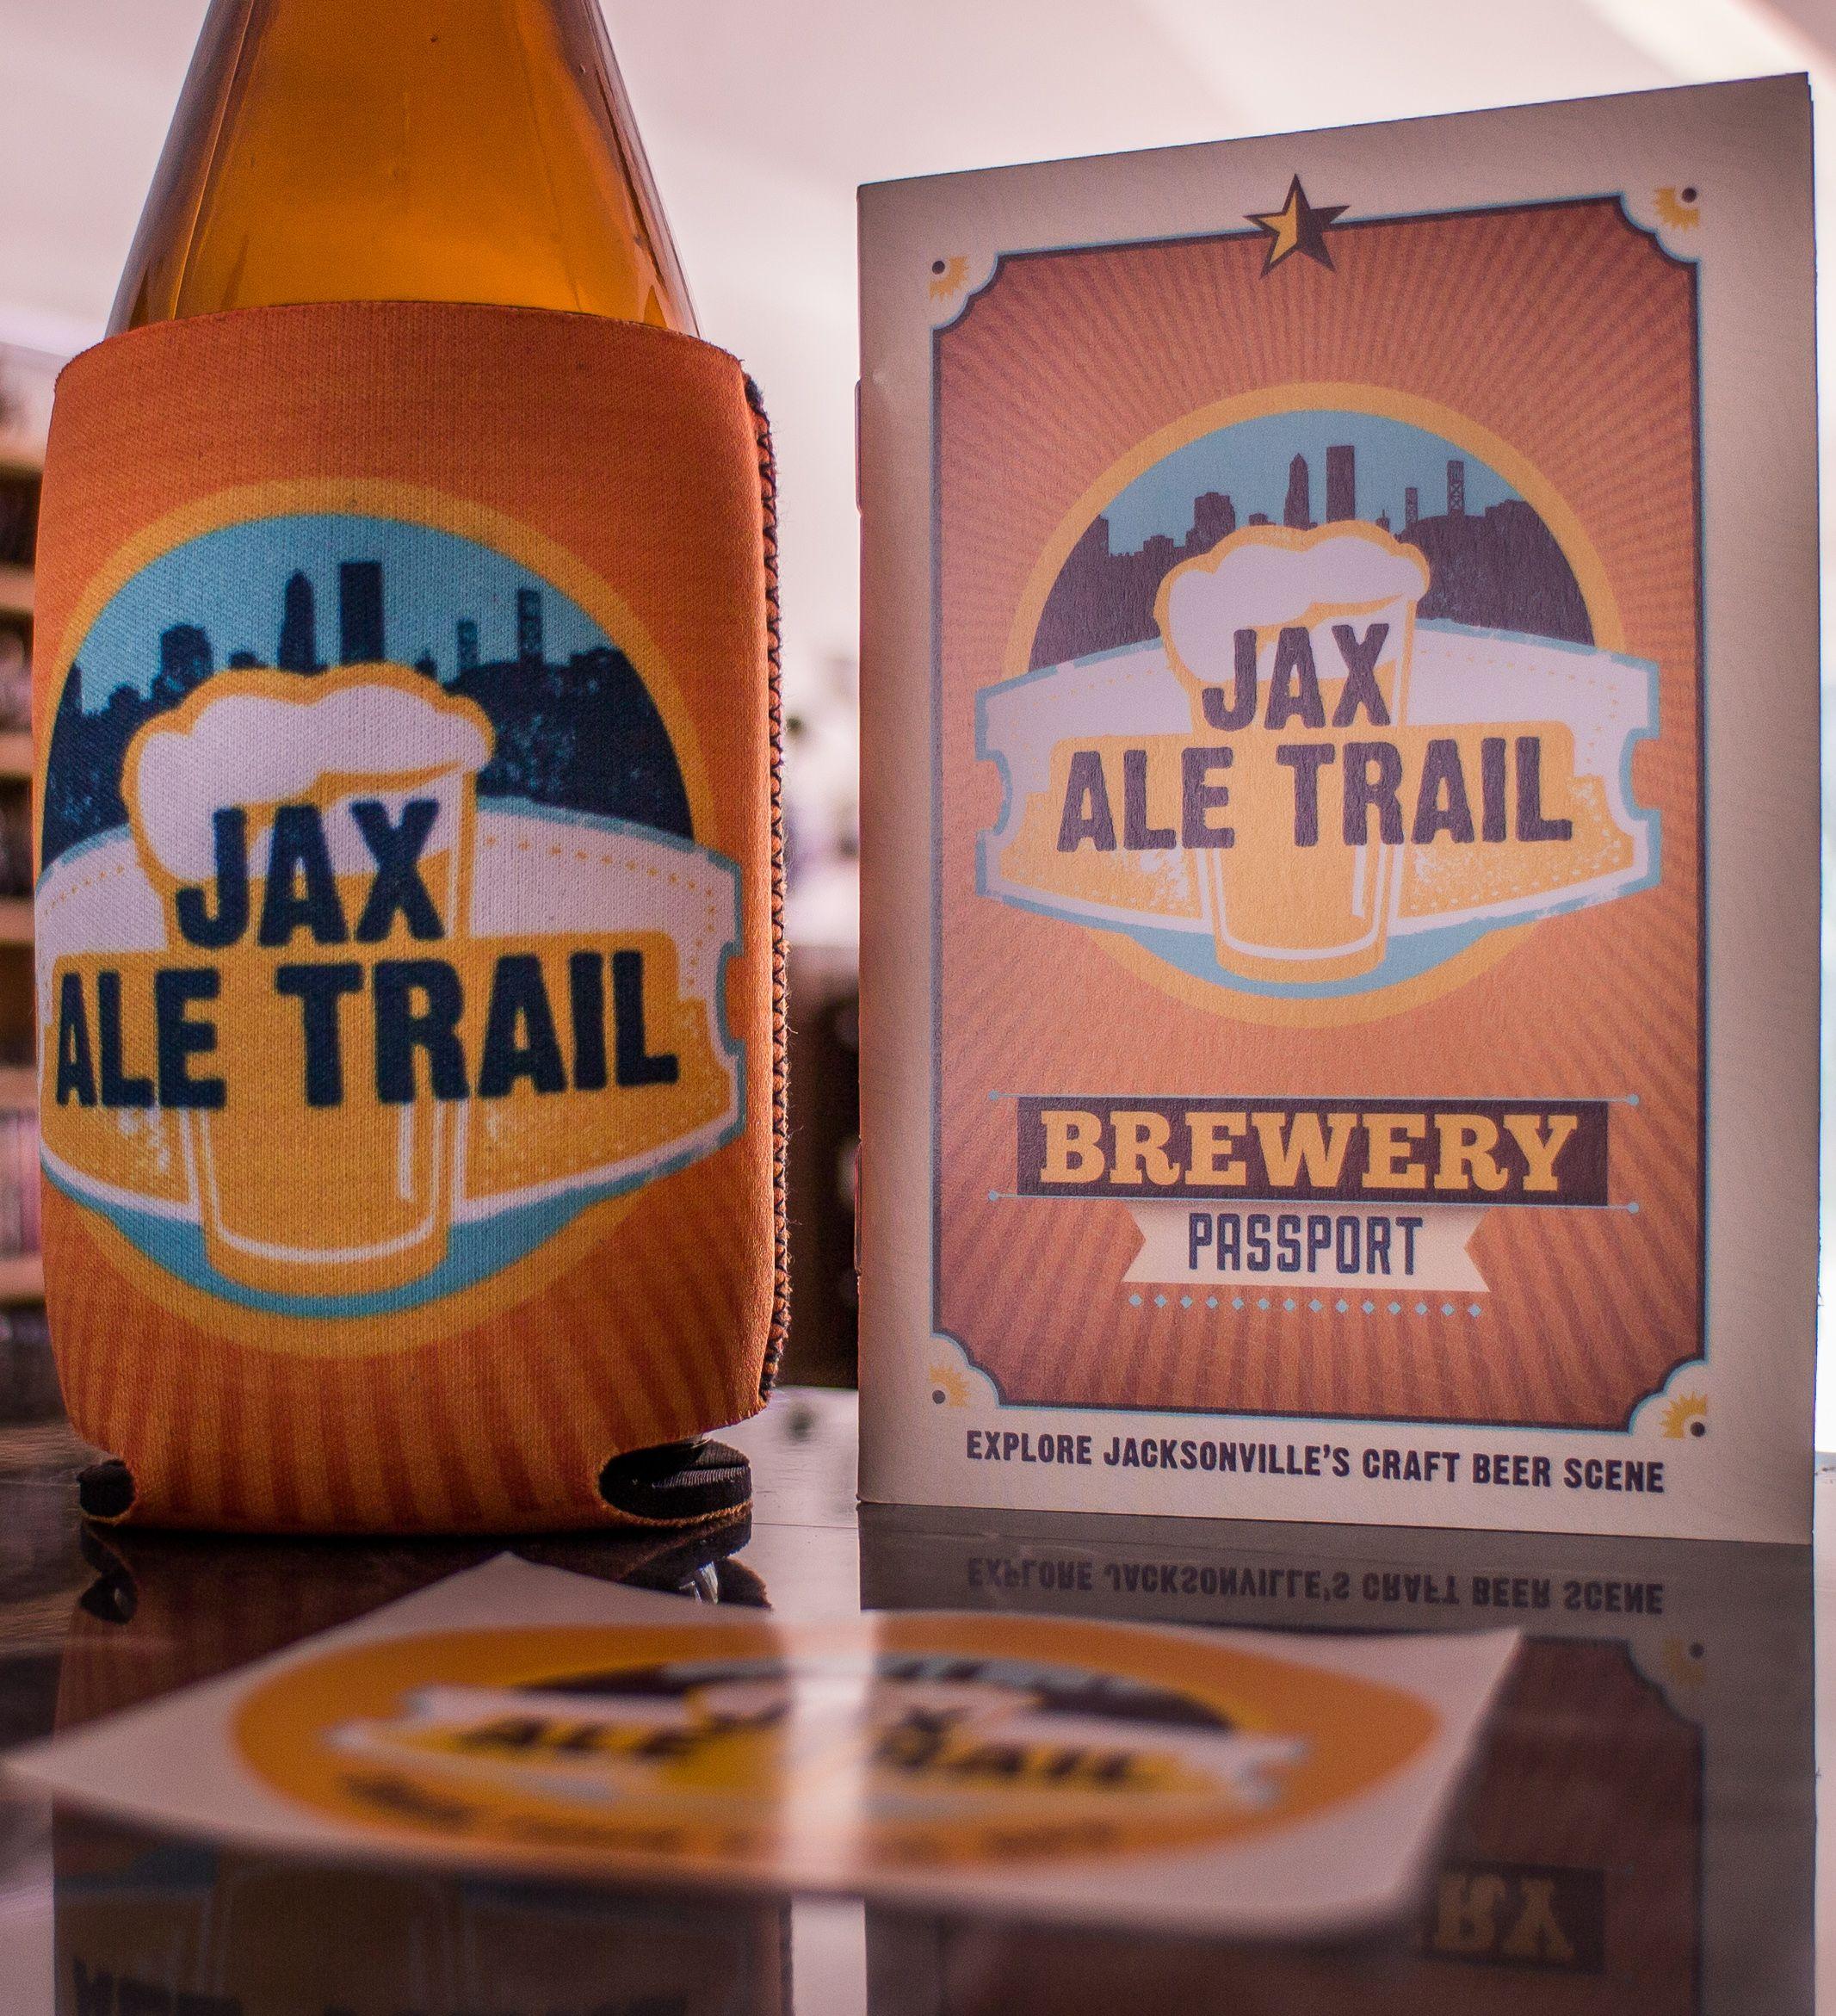 JAX Ale Trail Brewery, Summer activities, Jacksonville